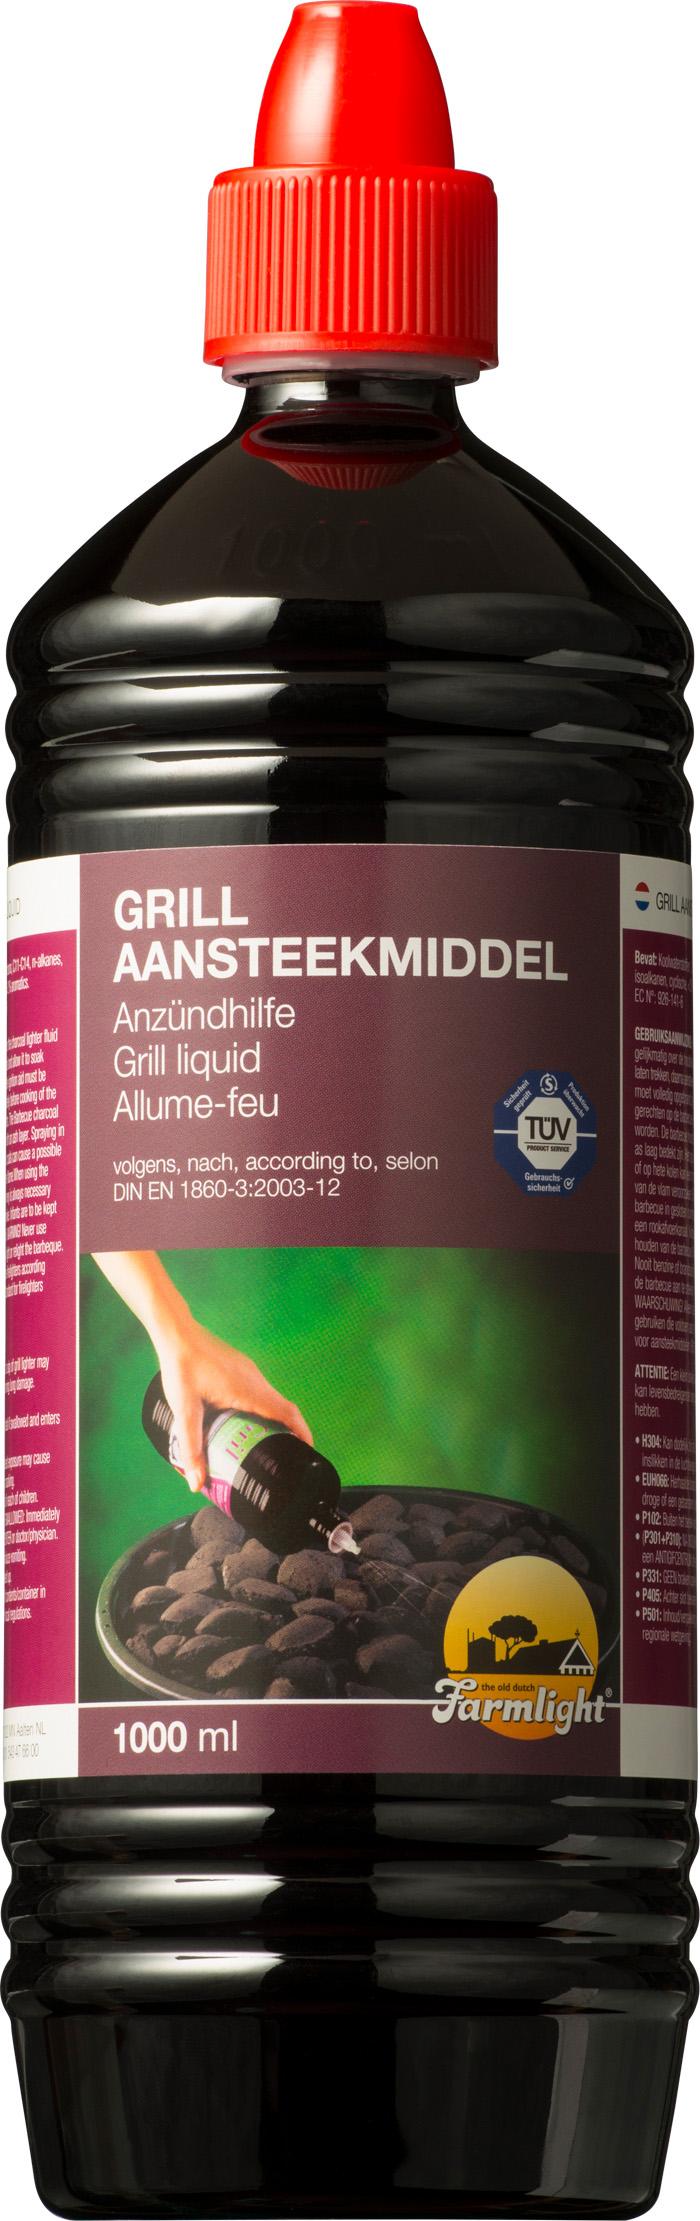 00202 - Farmlight Grill Anzündflüssigkeit 1000 ml